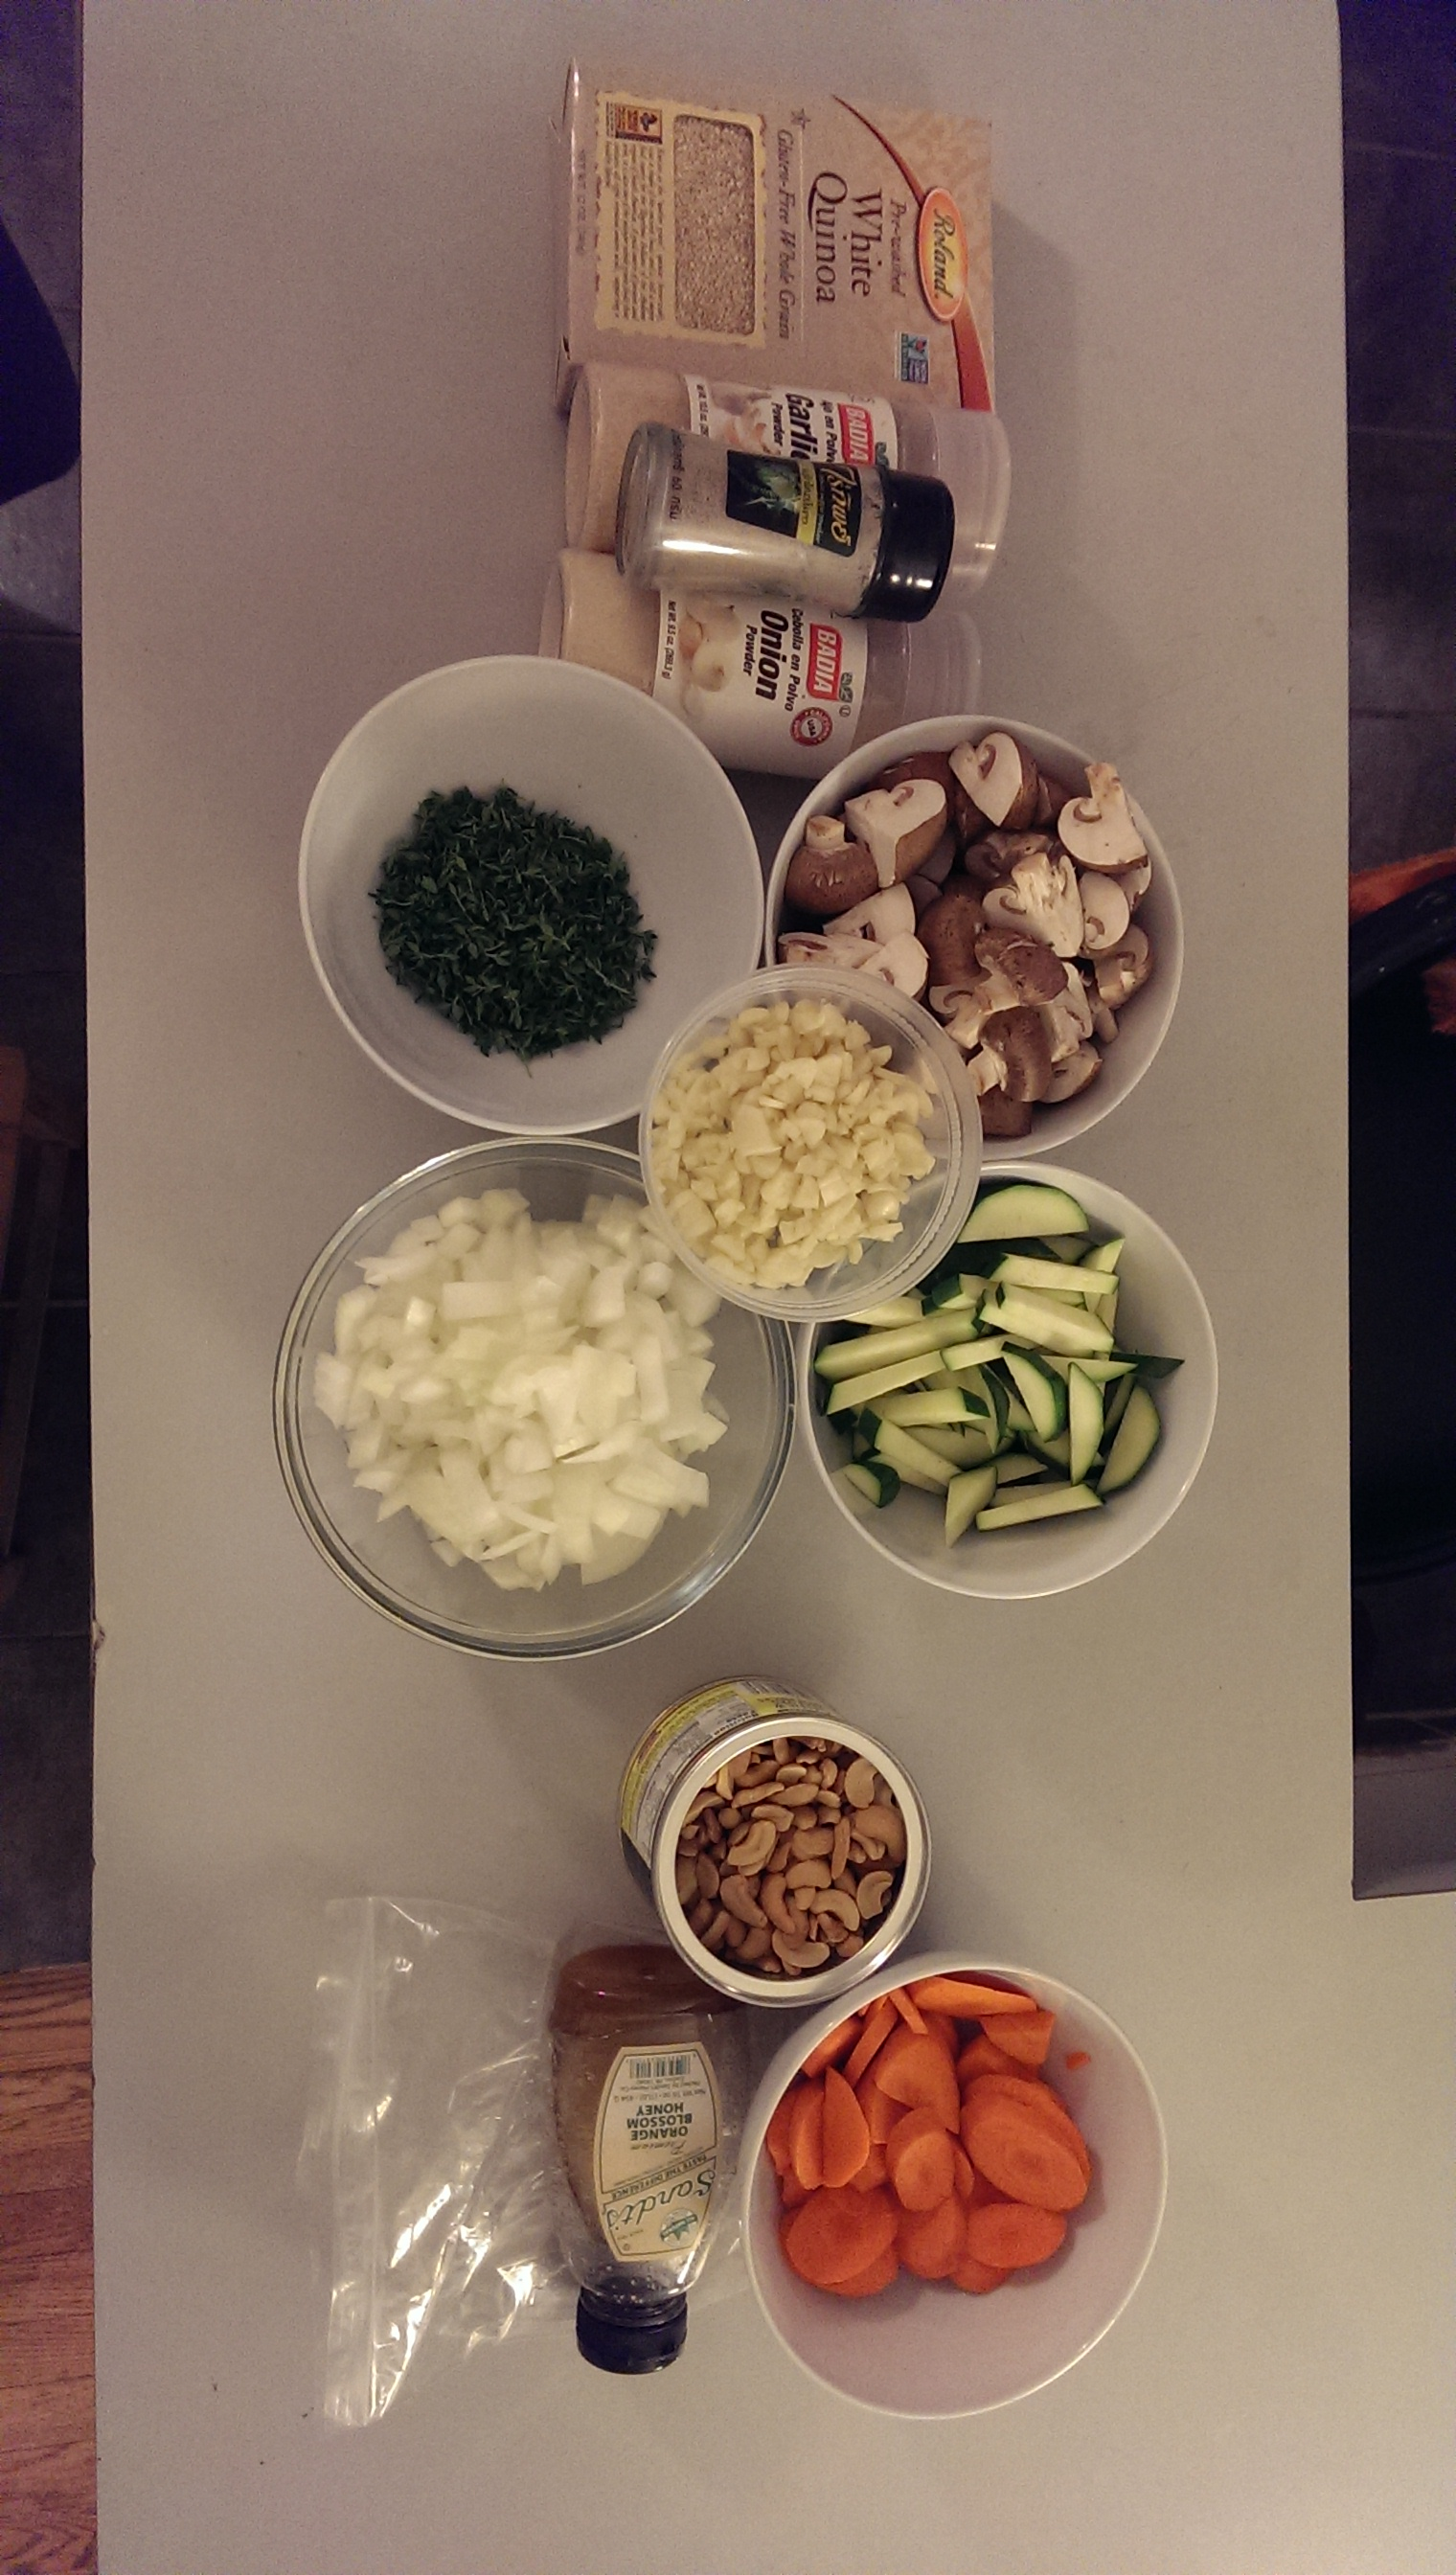 The cooking challenge begins!